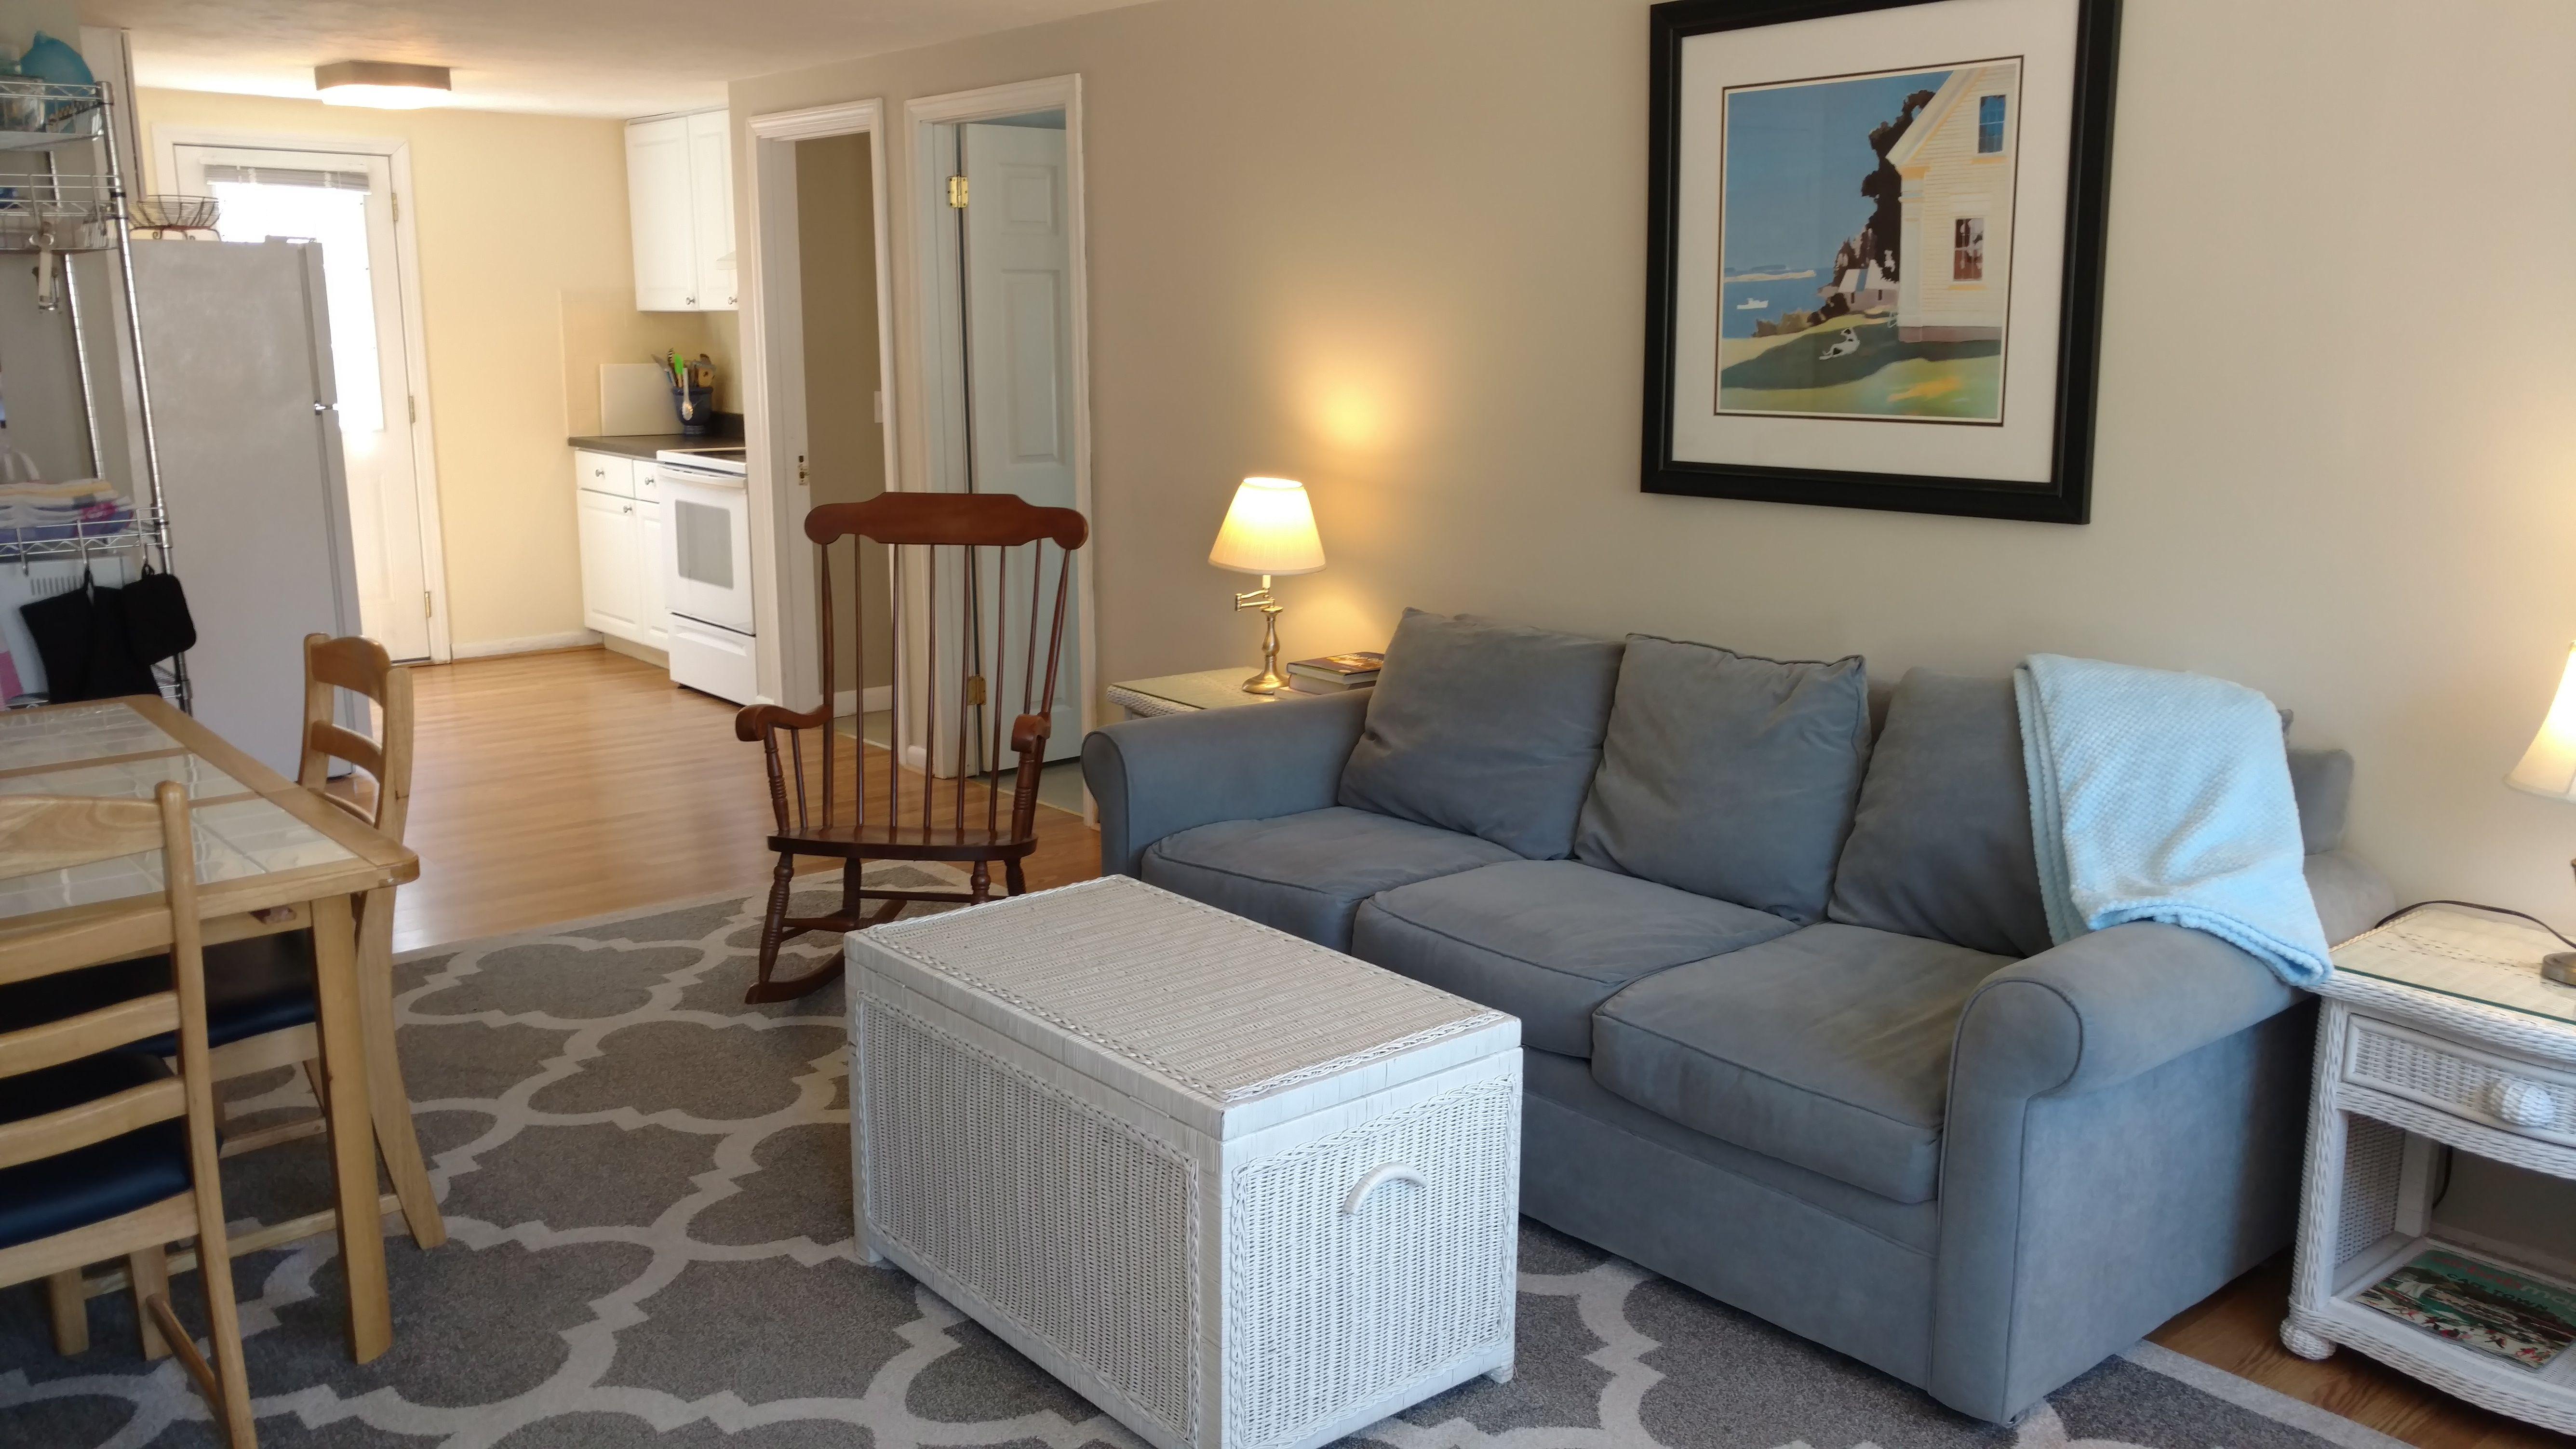 Sweet Cape Cod cottage, sleeps 6, Dennis Port! Home